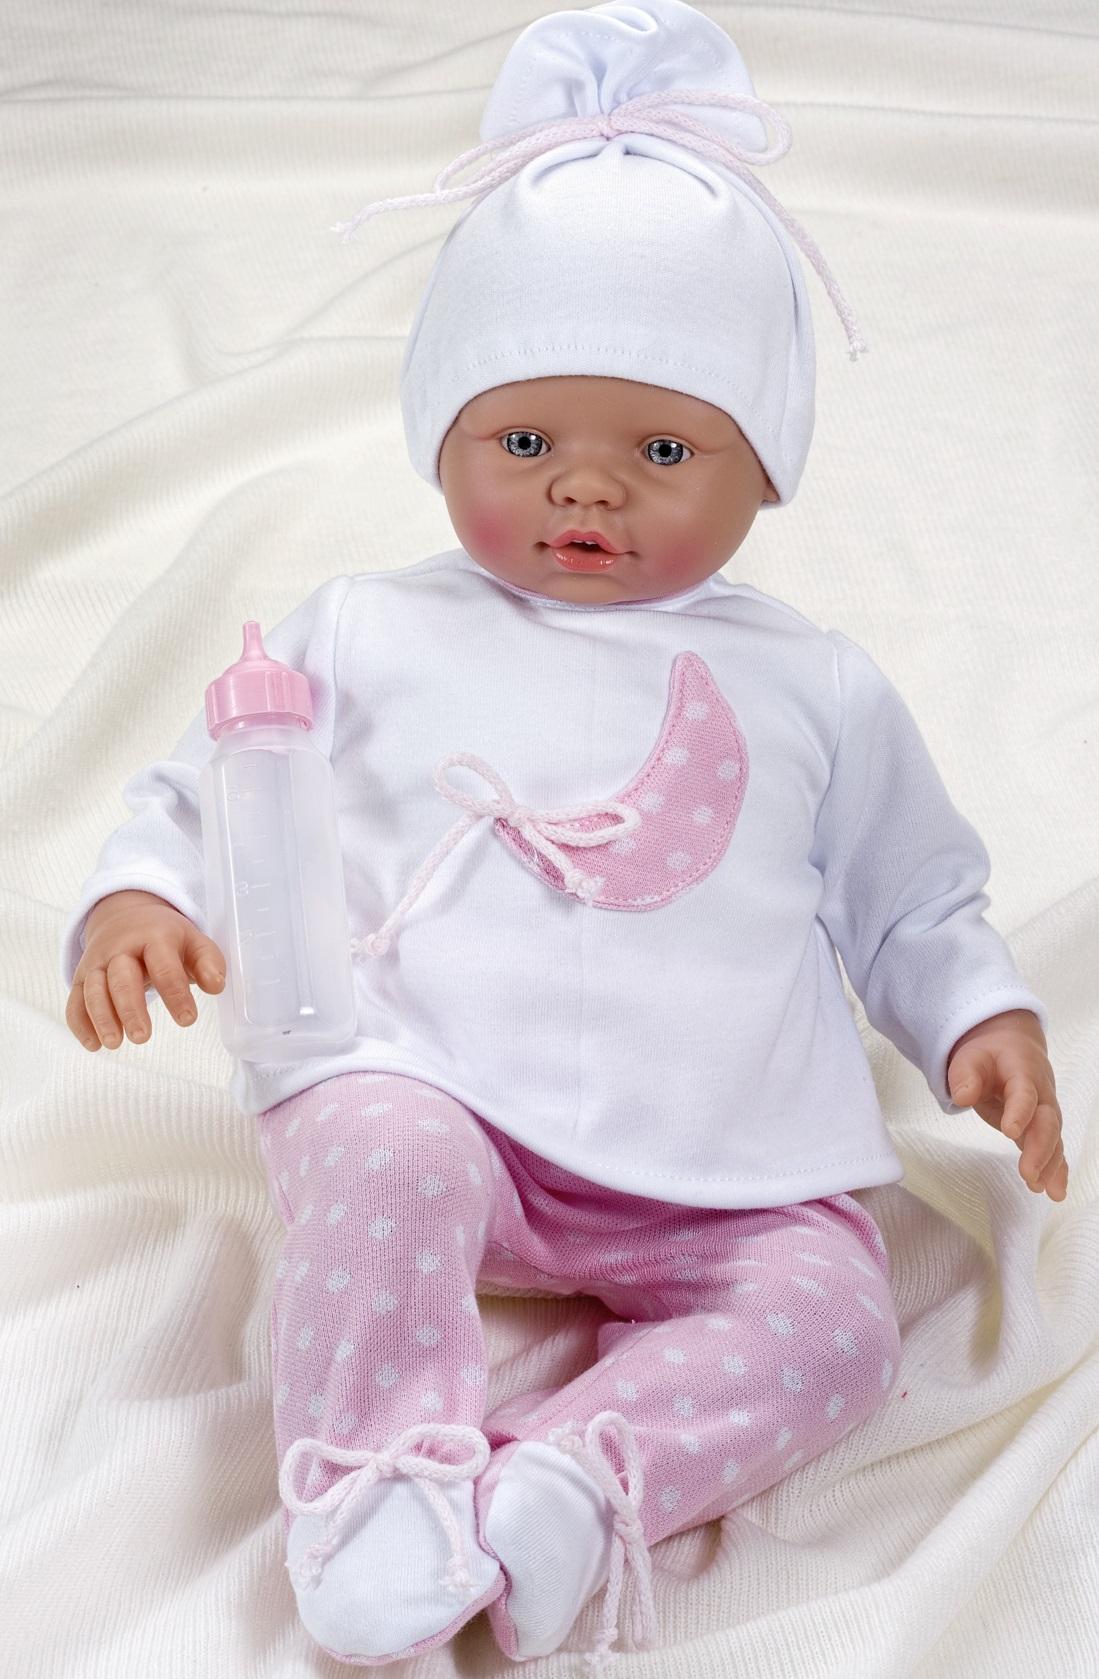 Кукла Неус с бутылочкой, 45 см.Куклы ASI (Испания)<br>Кукла Неус с бутылочкой, 45 см.<br>